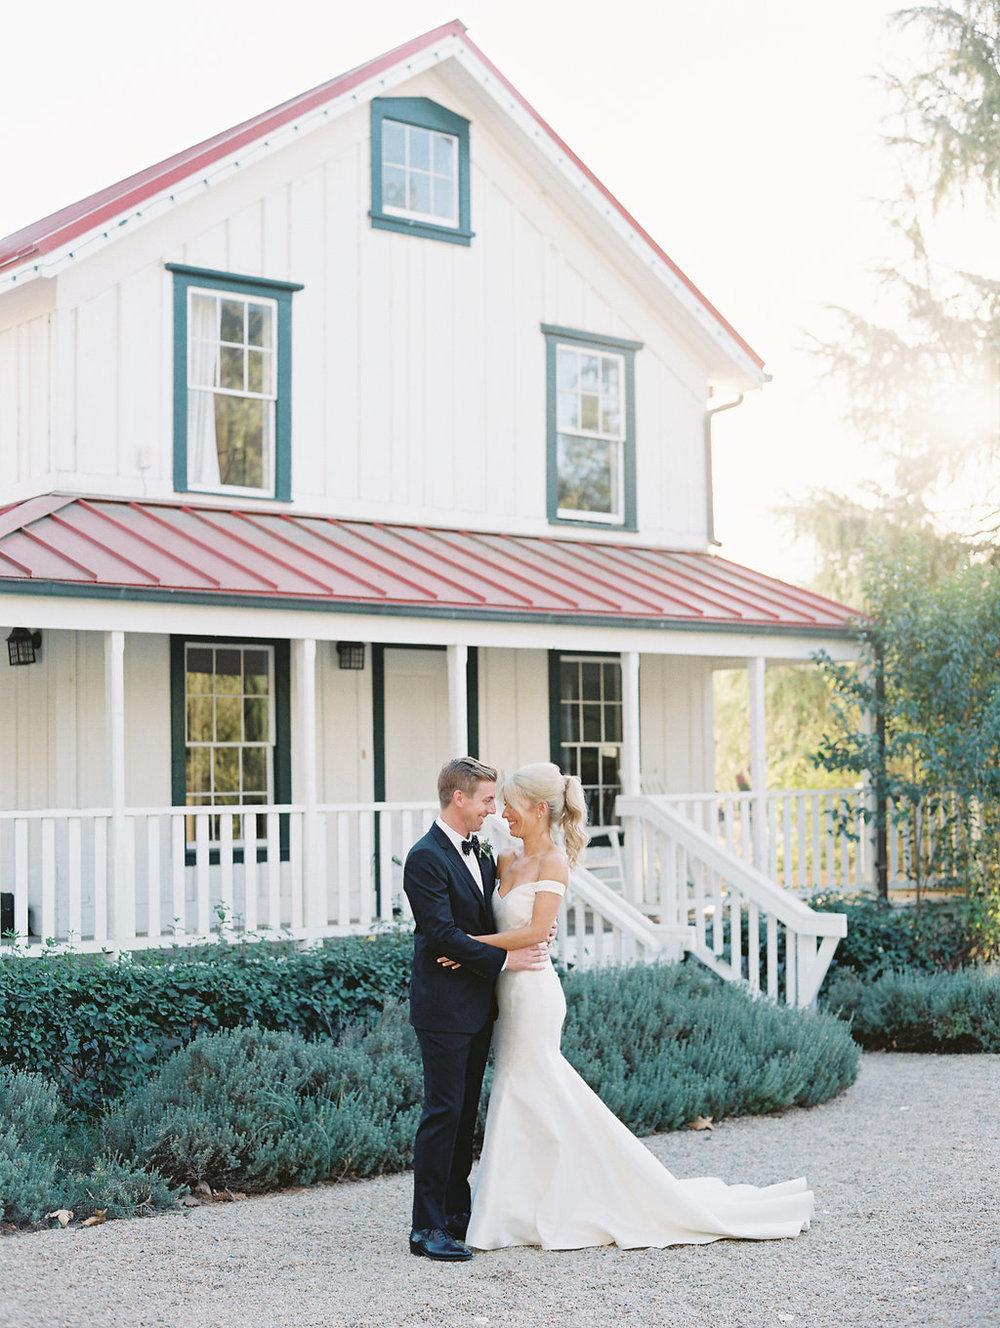 www.santabarbarawedding.com | Soleil Events | Mattei's Tavern | Bride and Groom